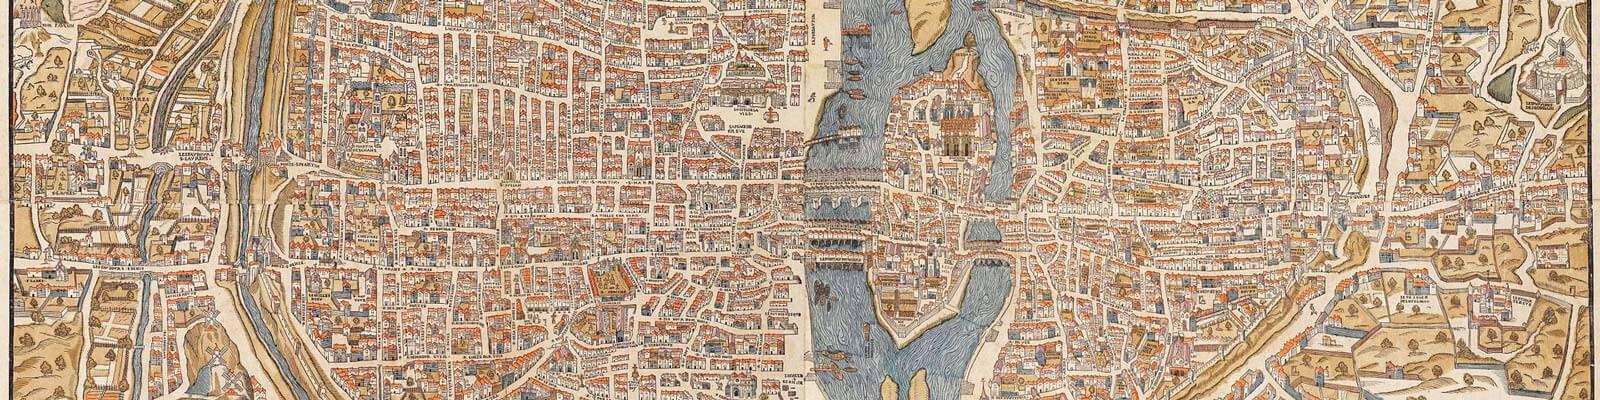 carte arrondissement paris